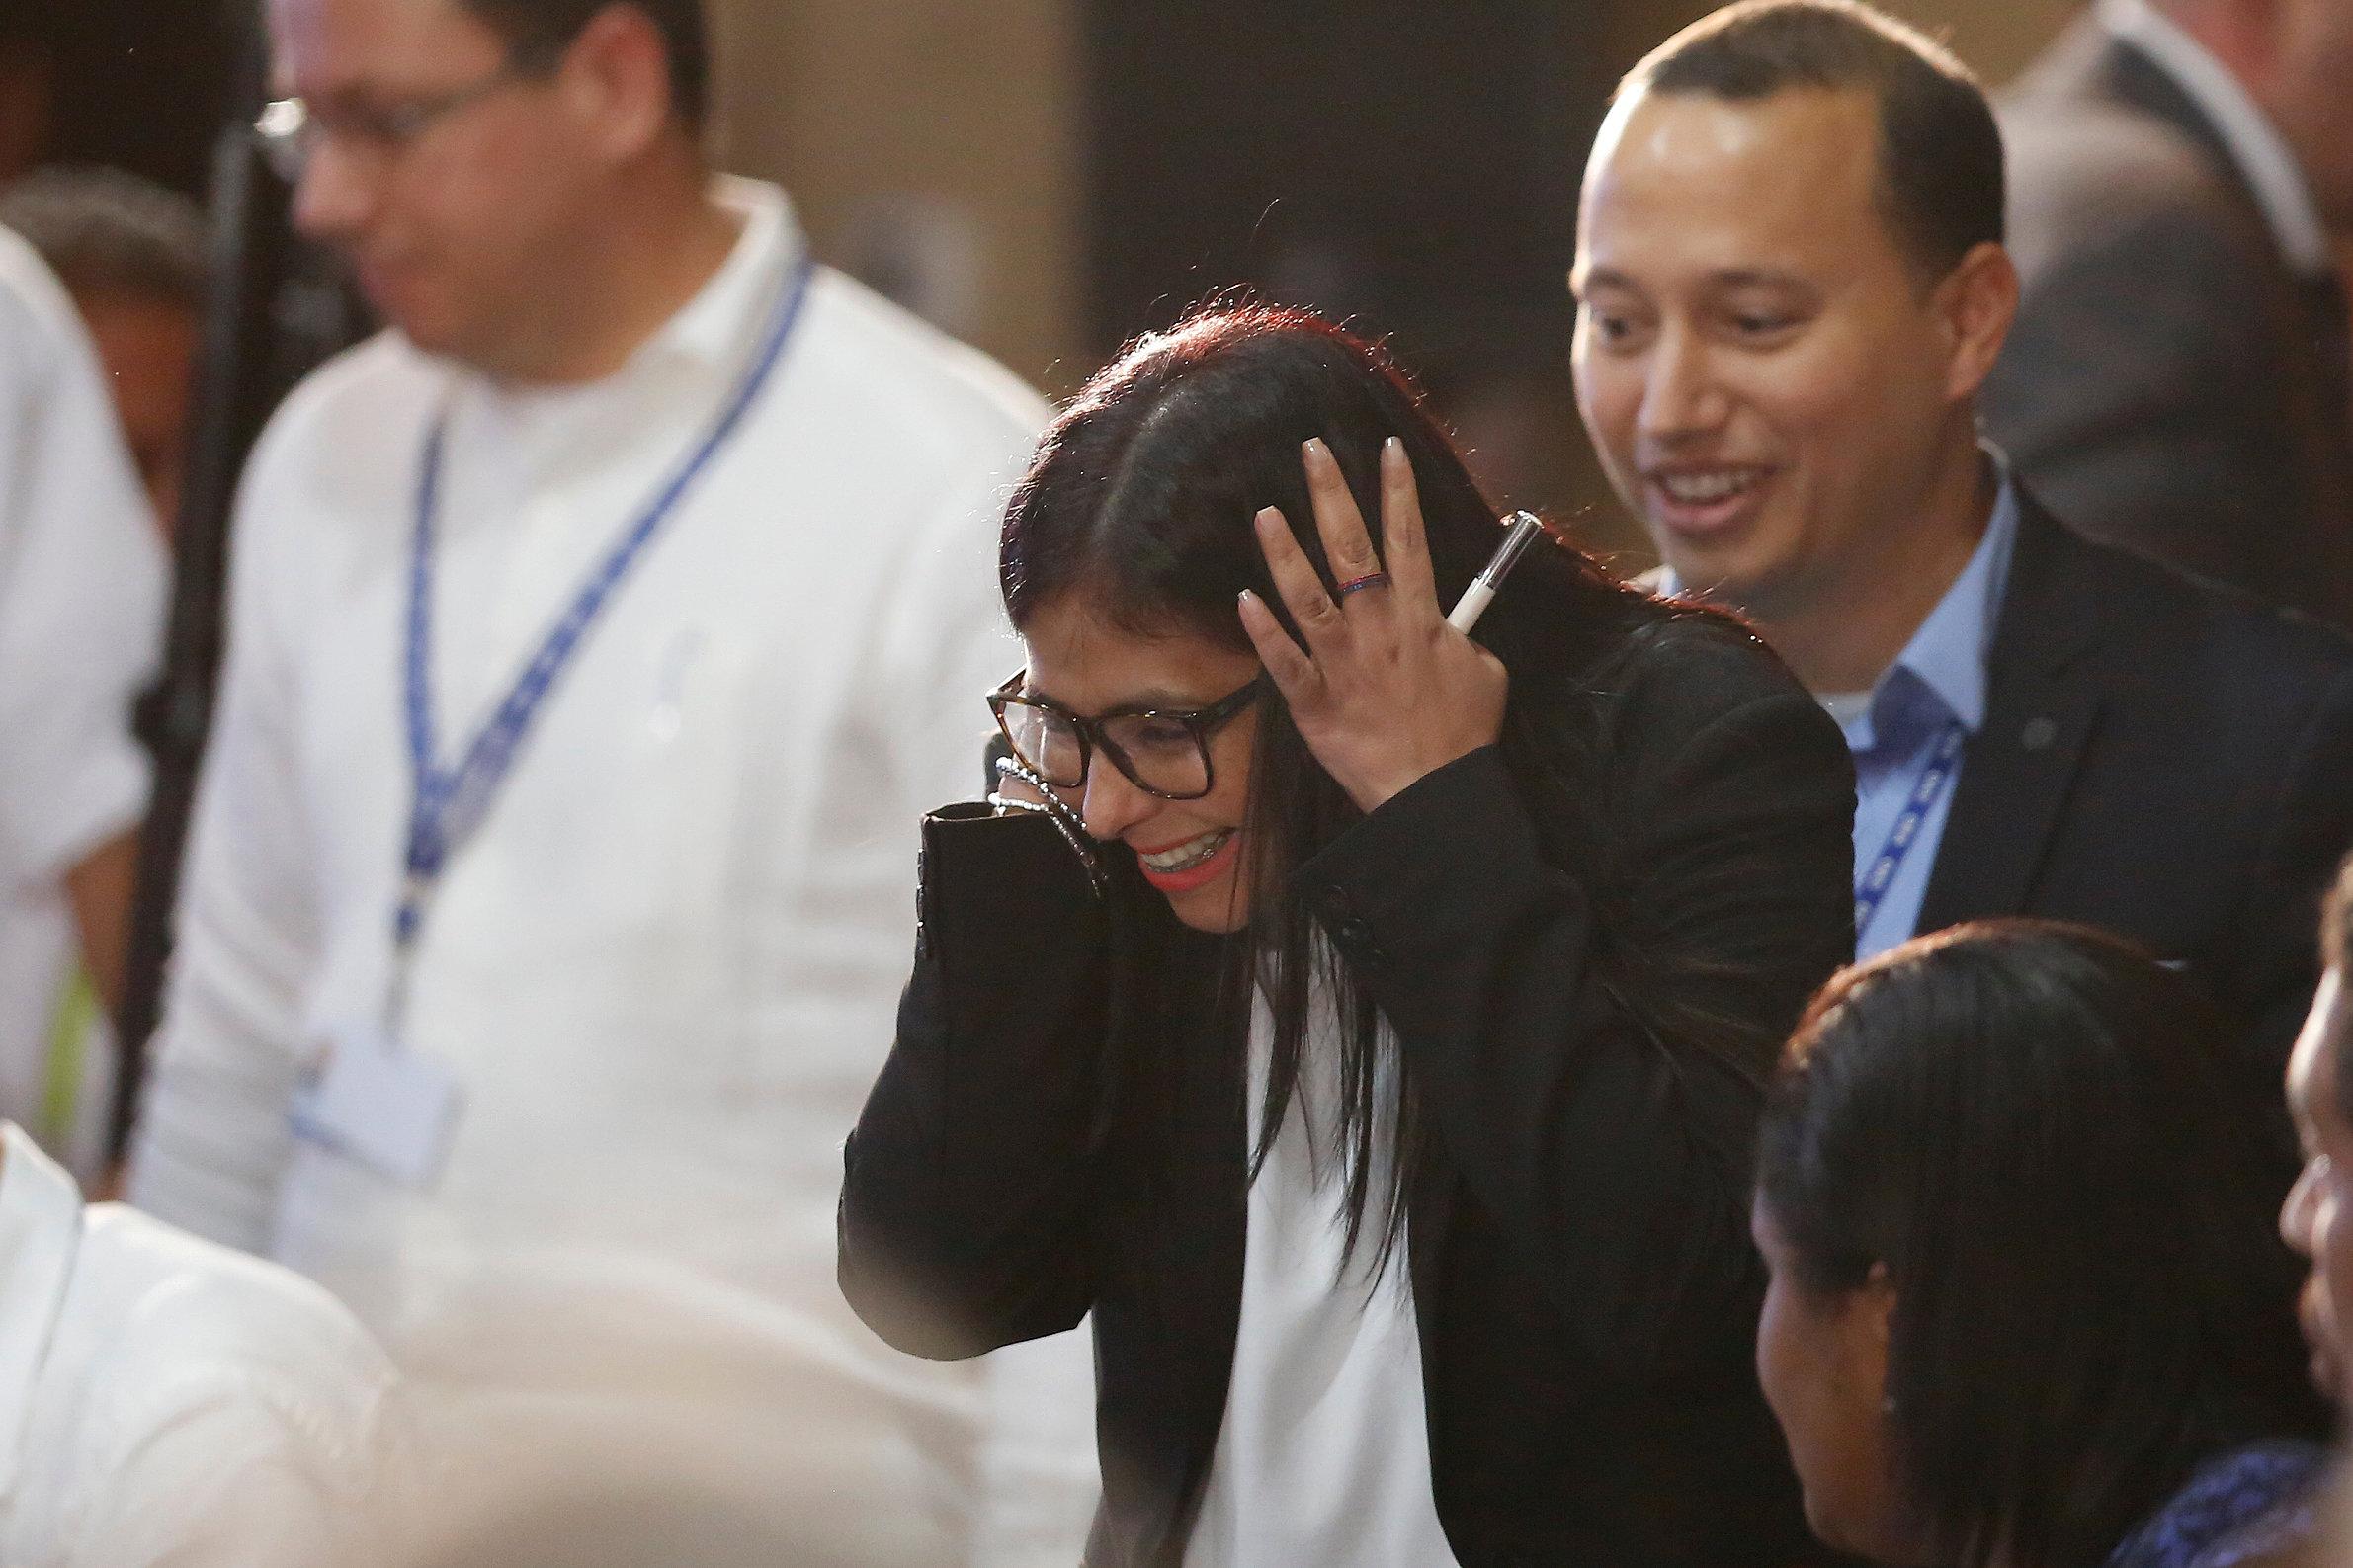 La canciller venezolana, Delcy Rodríguez. REUTERS/Carlos Jasso